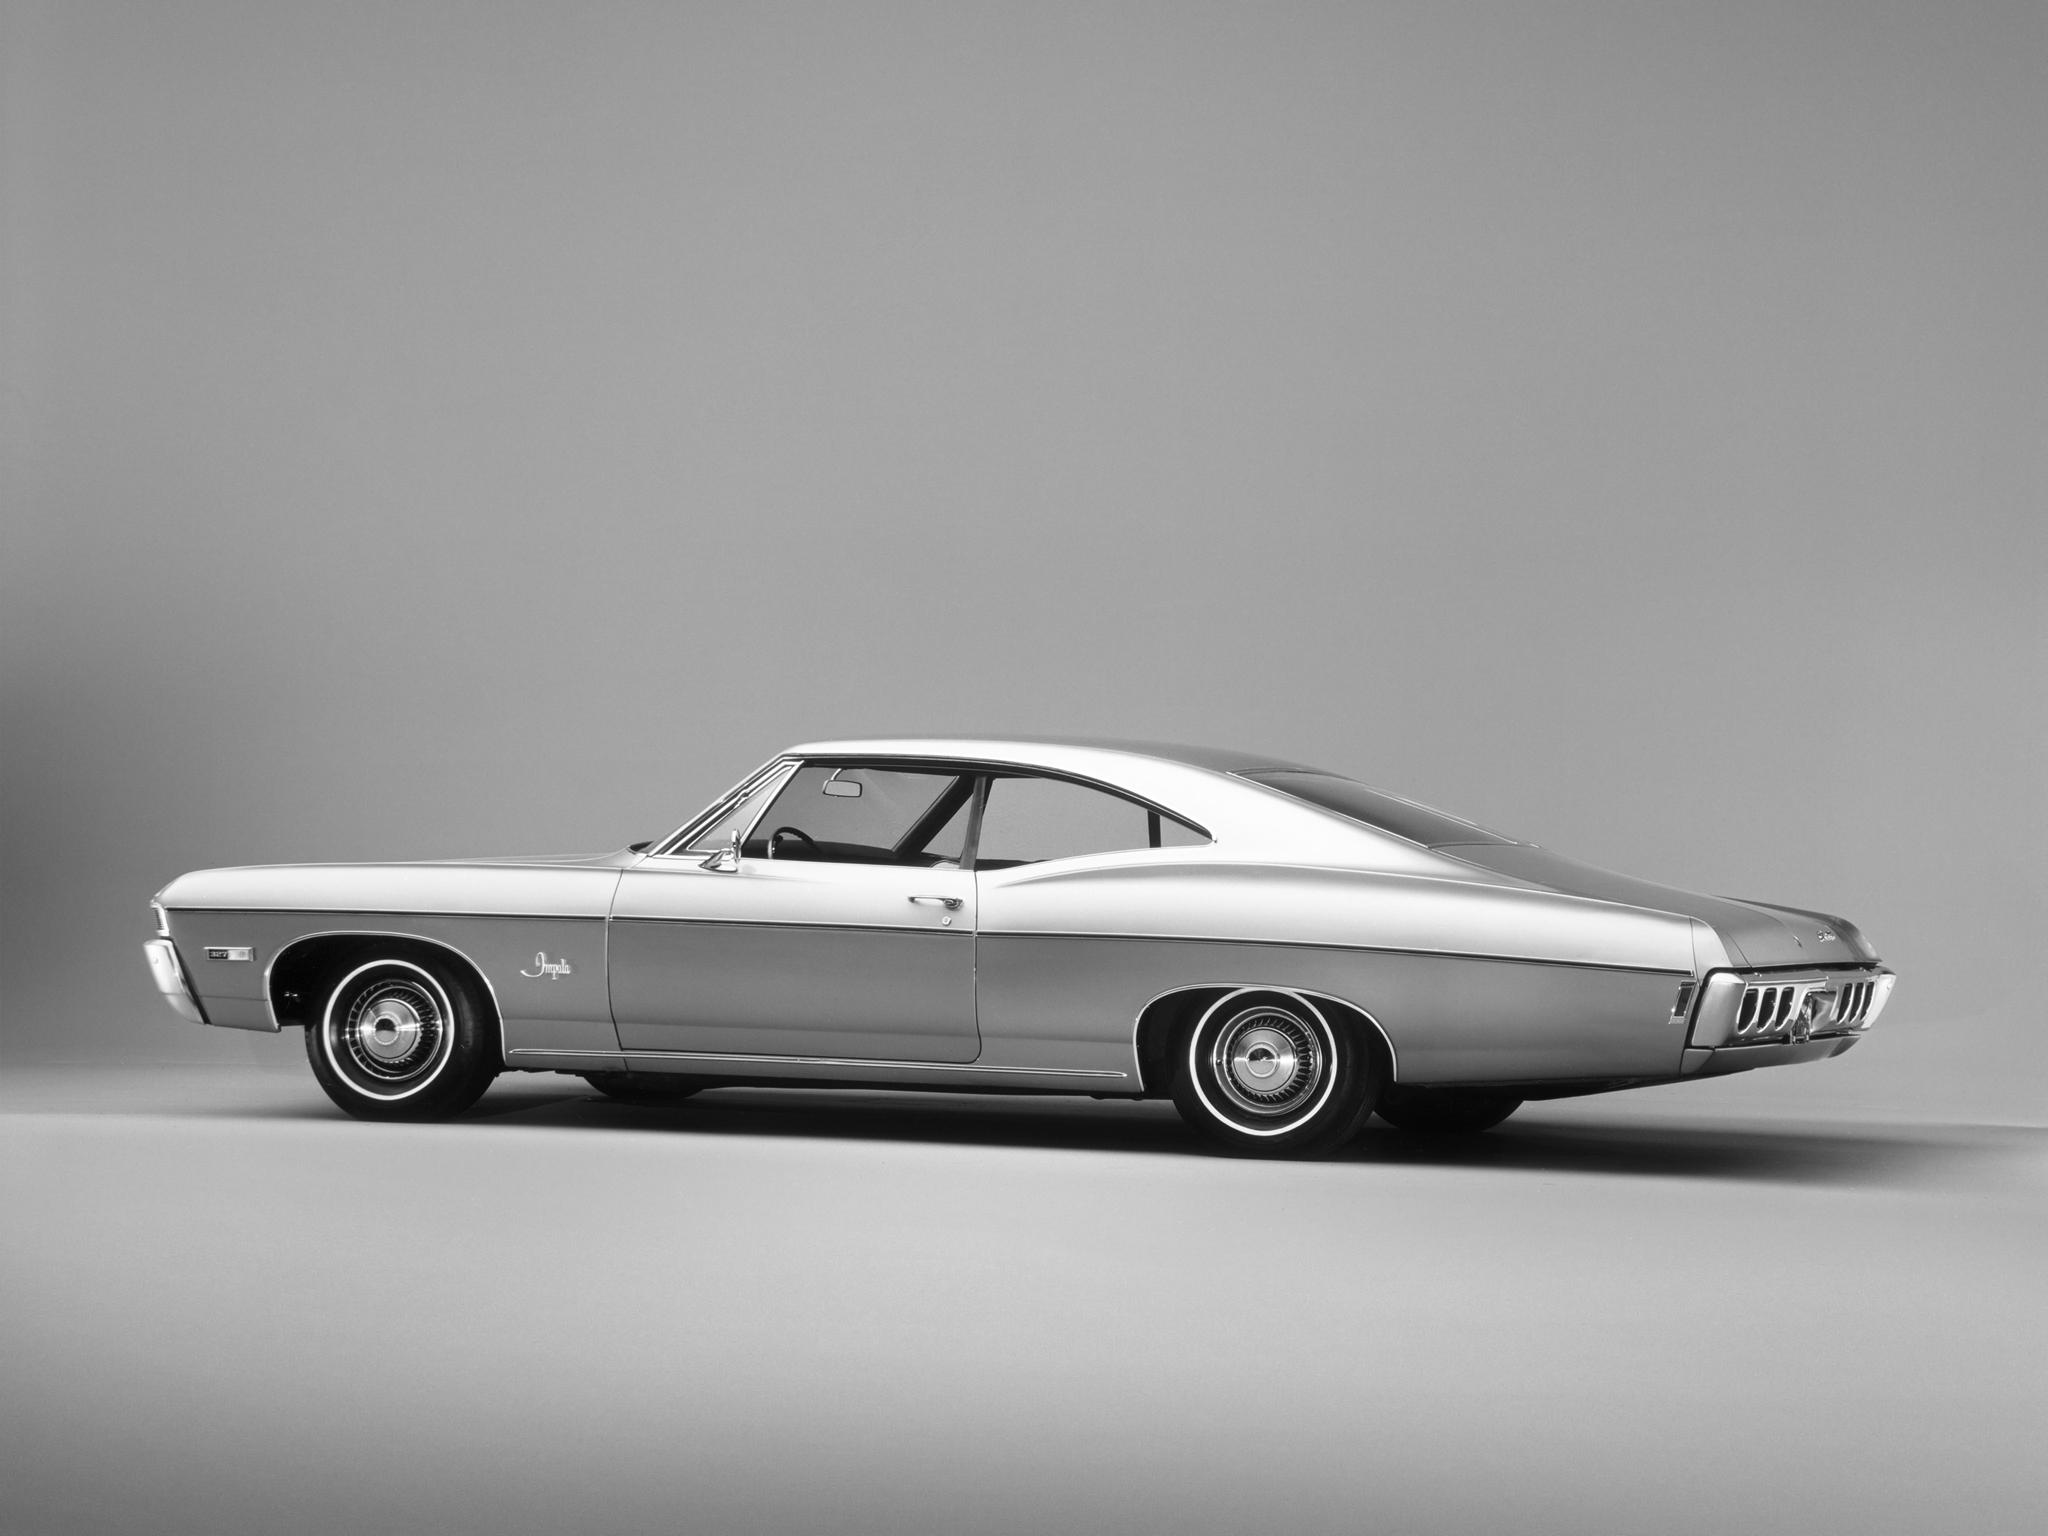 1968-chevrolet_impala-02.jpeg